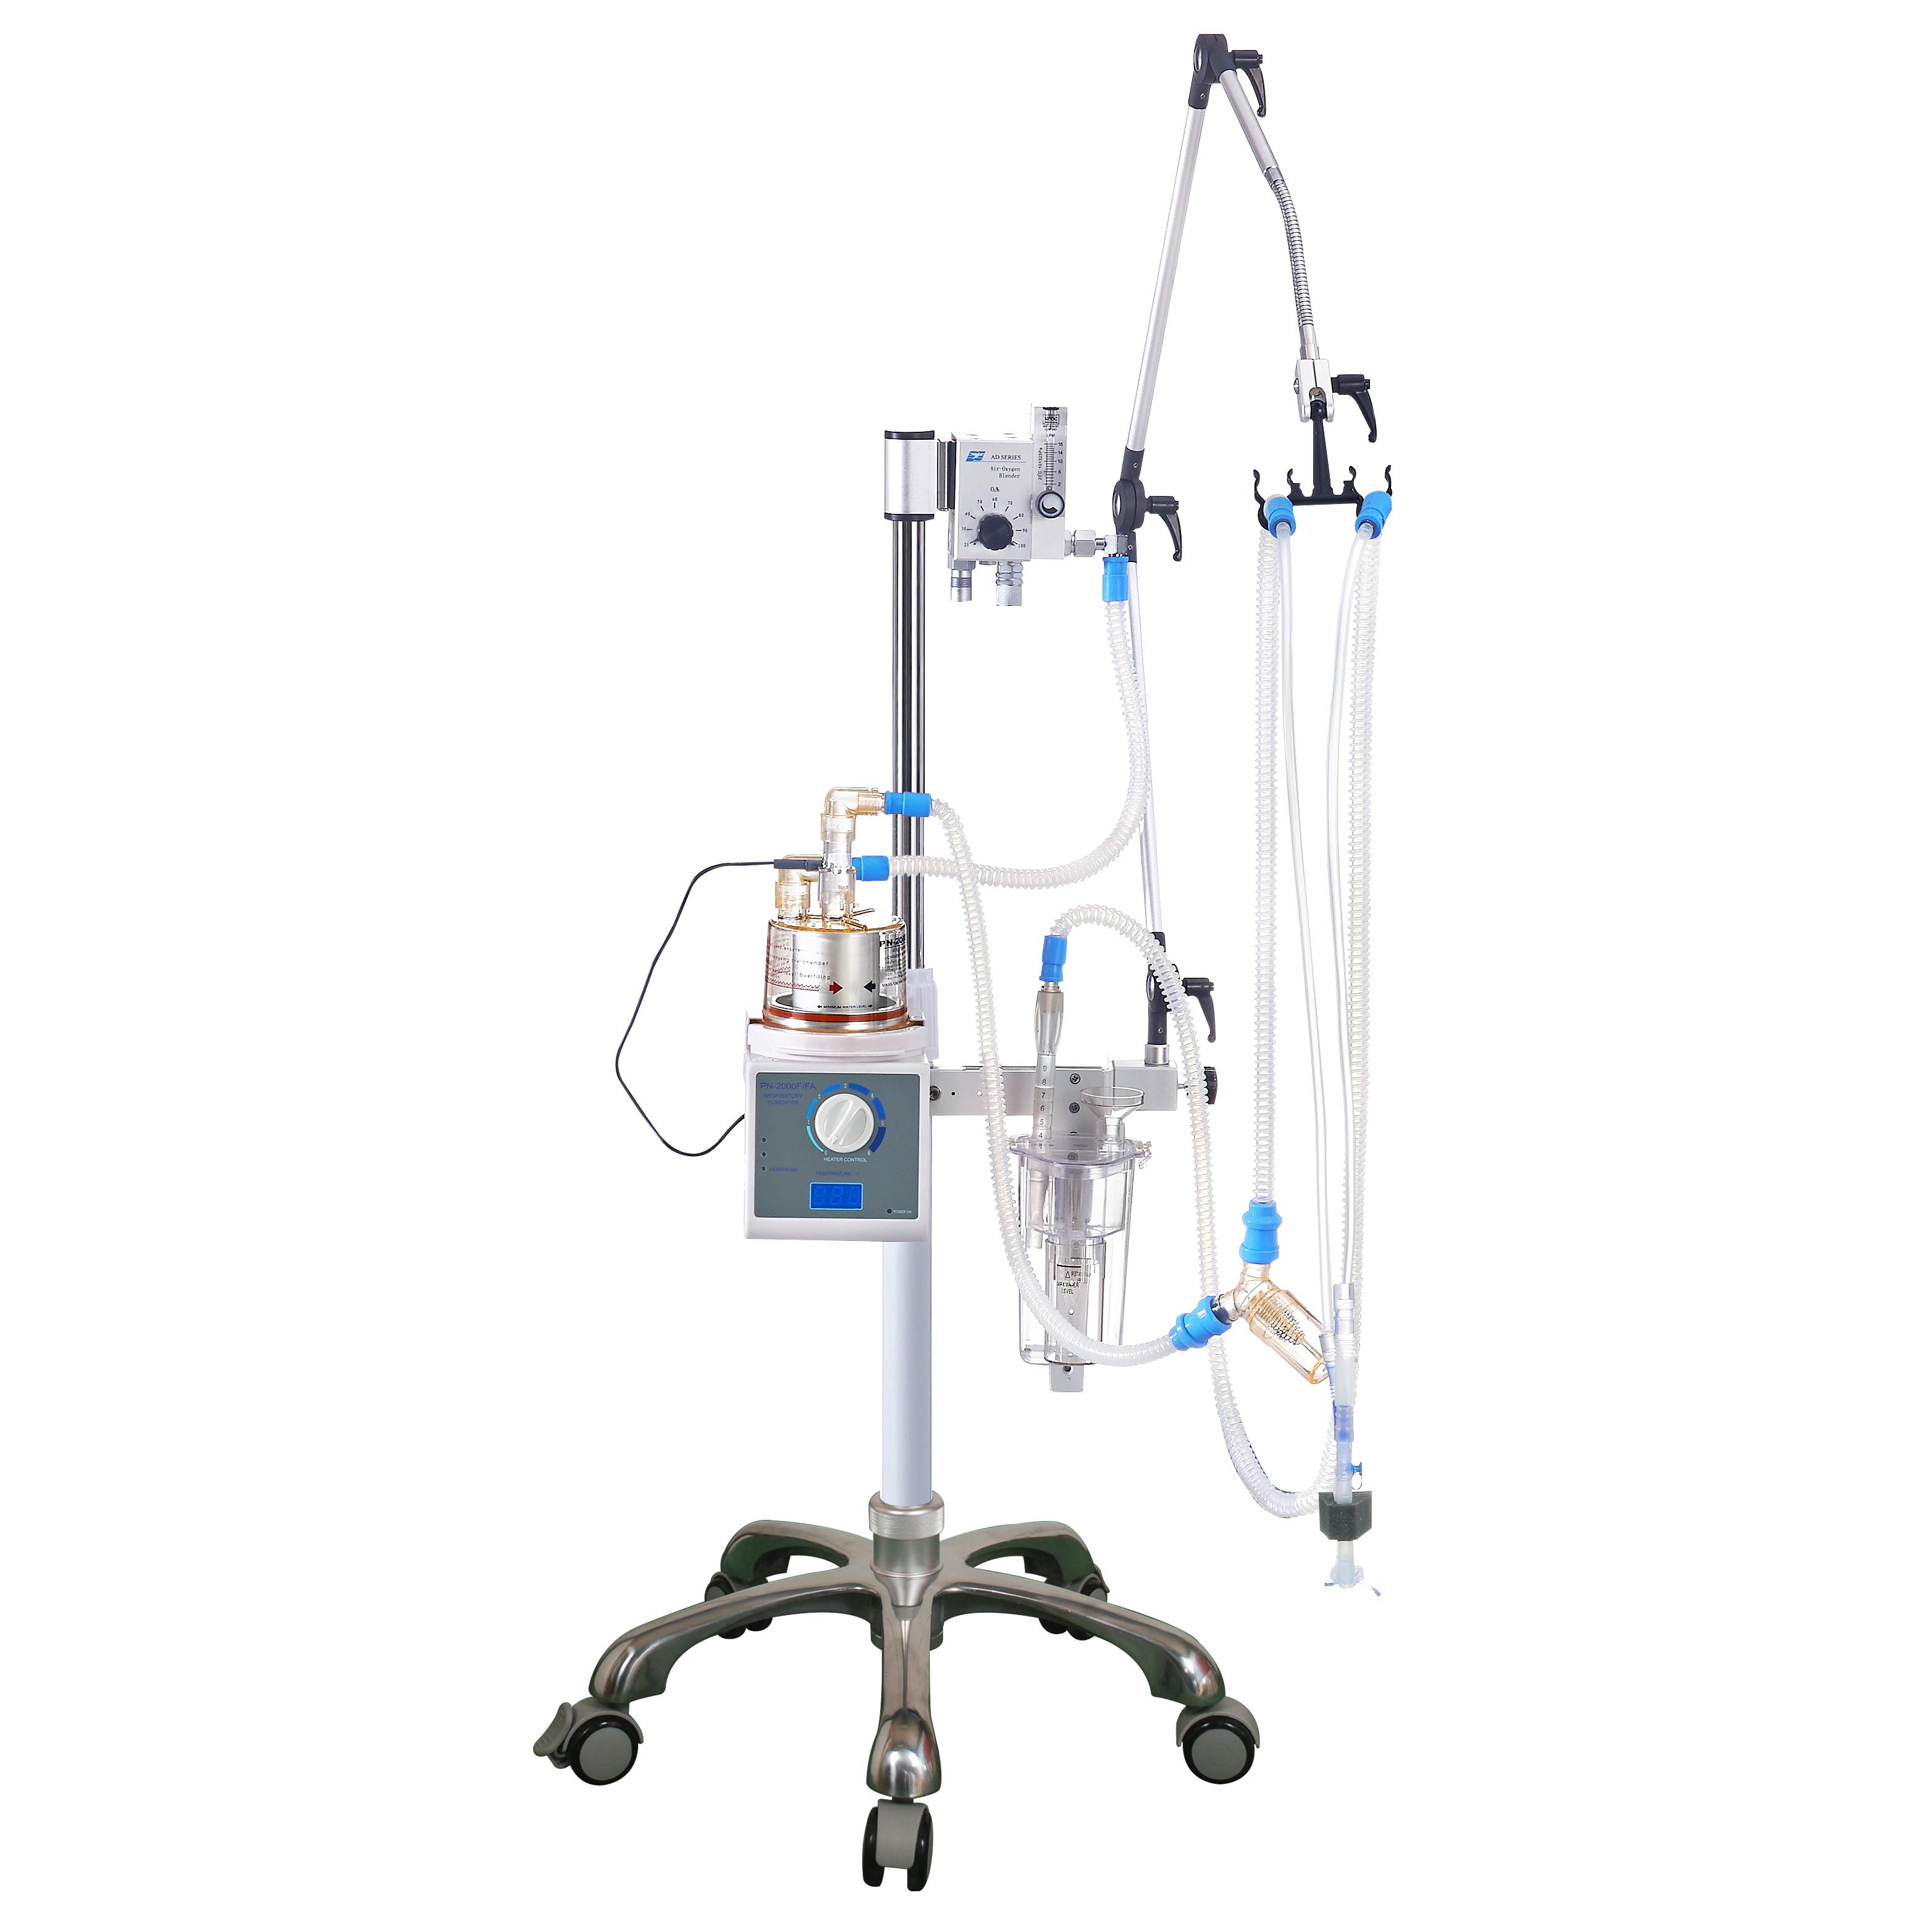 Infant Cpap Bubble CPAP noninvasive Nasal continuous positive airway pressure - KingCare | KingCare.net